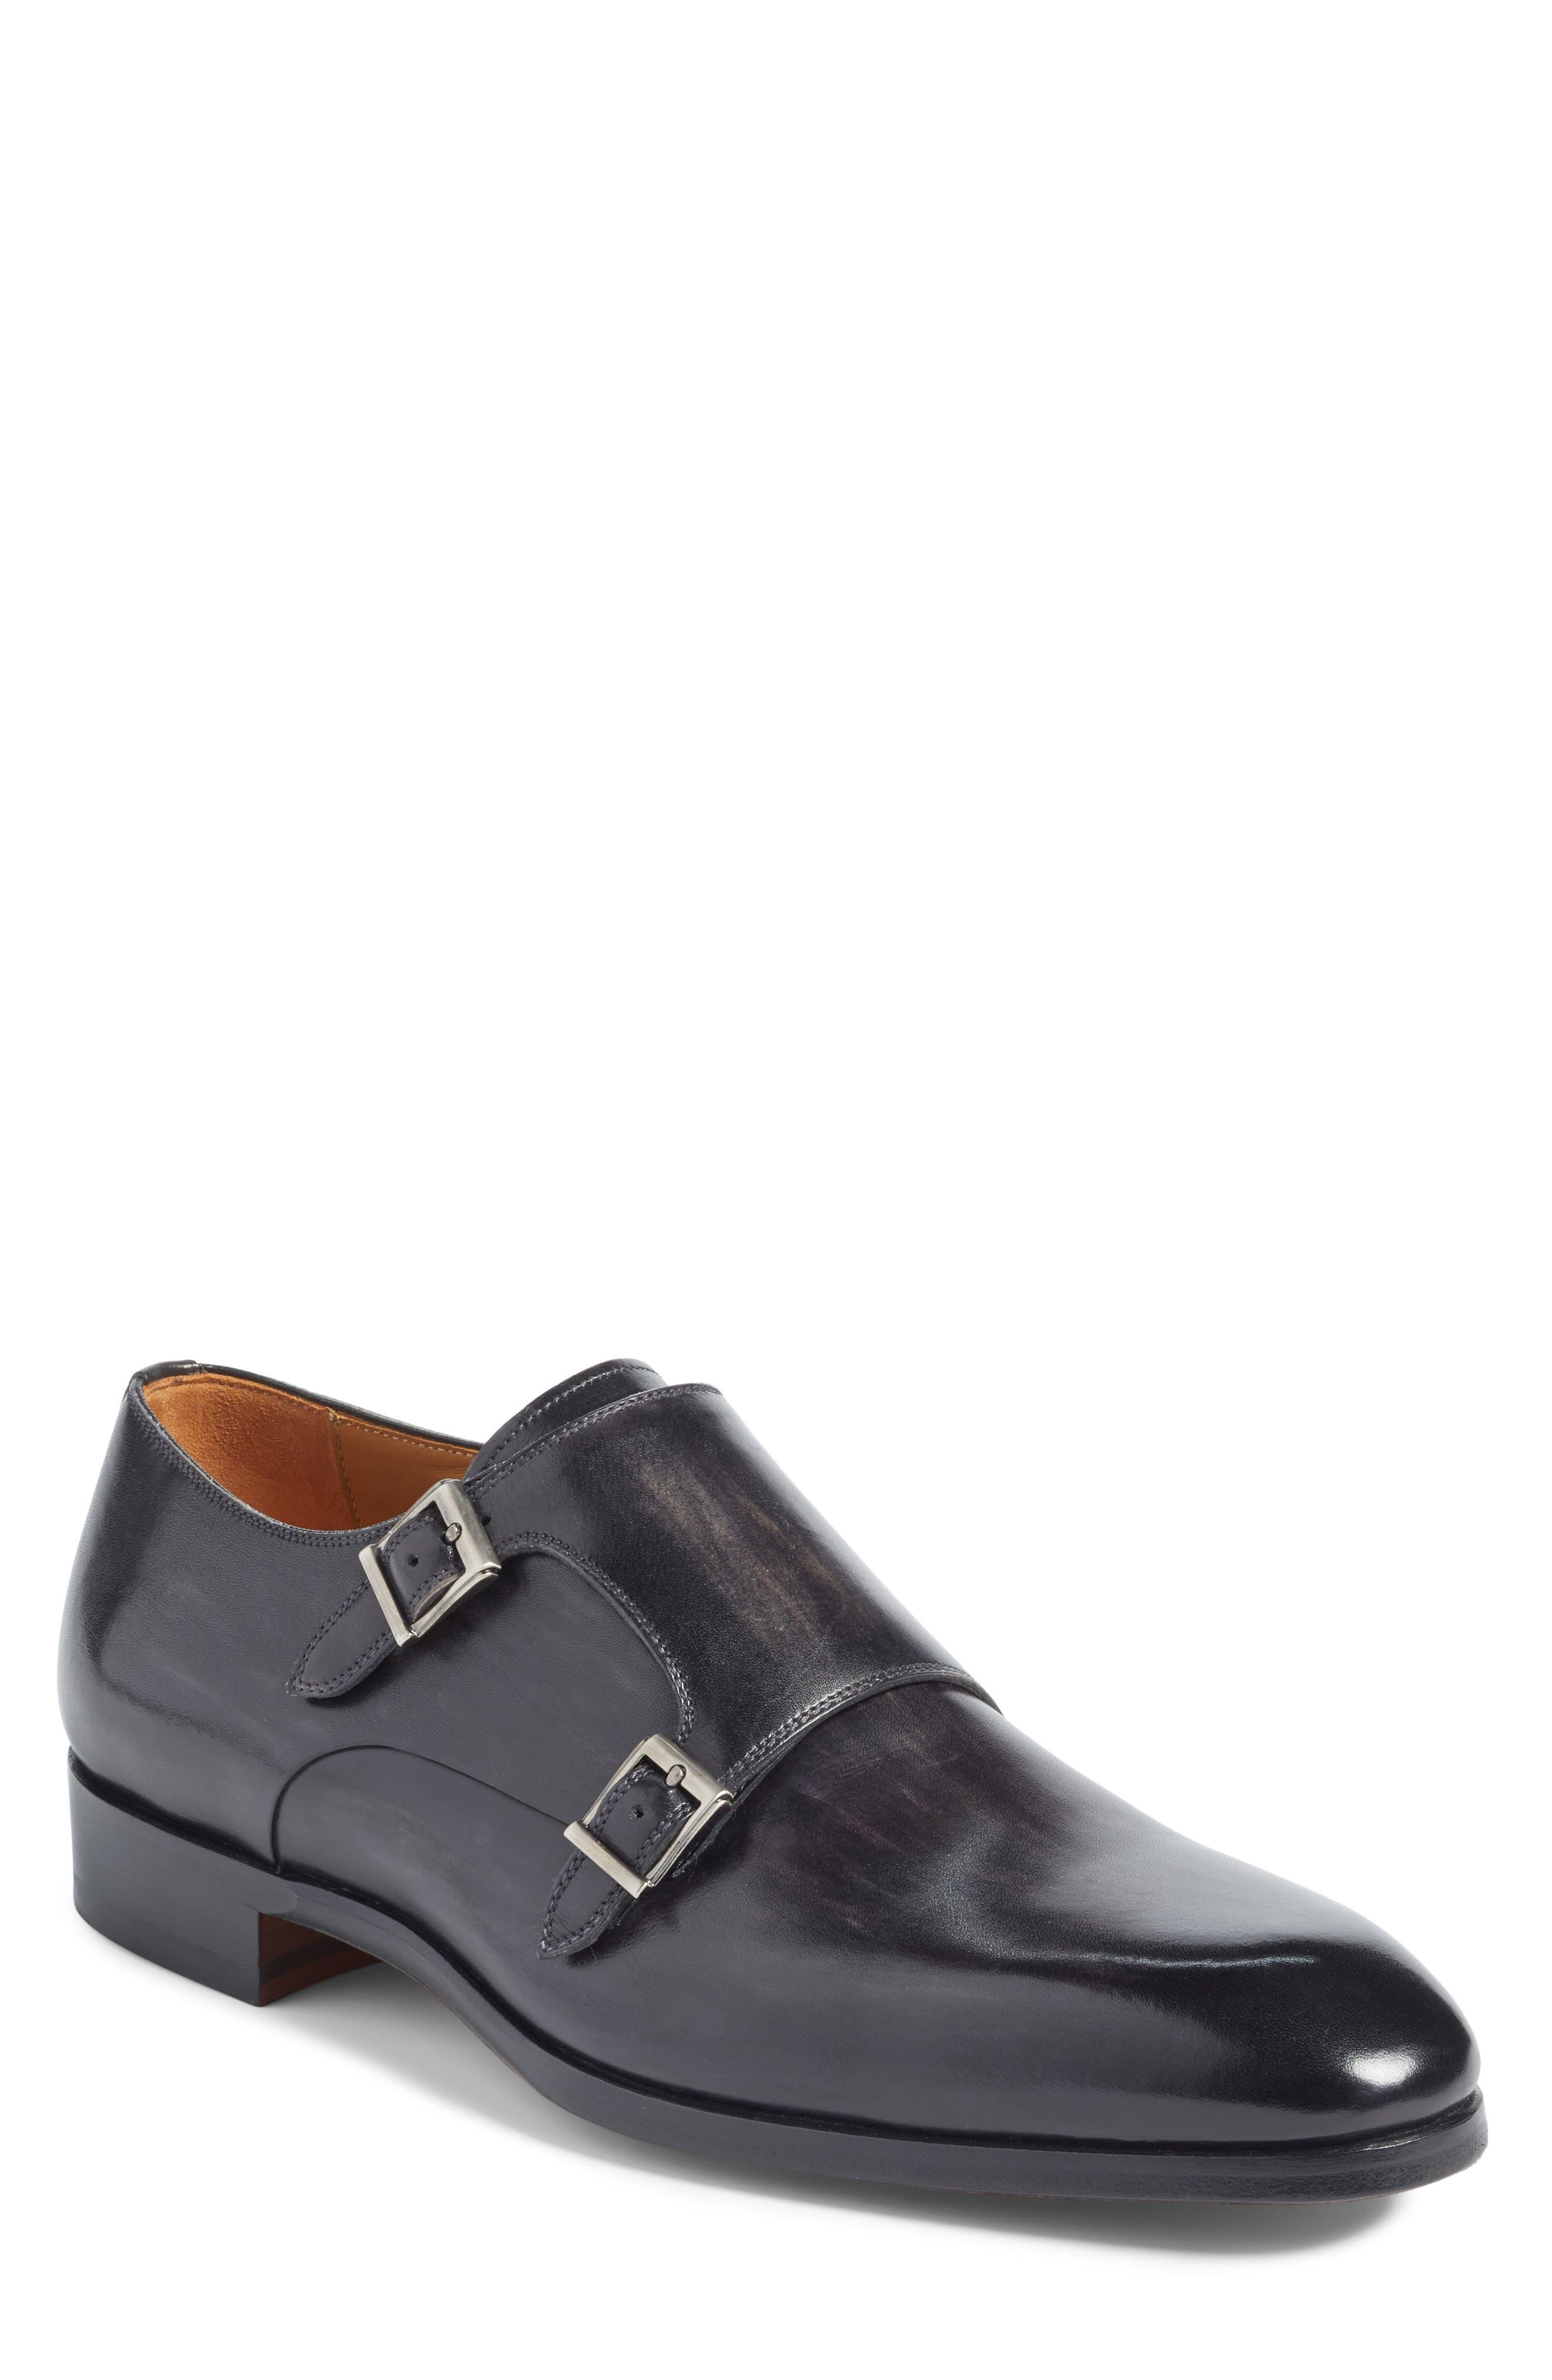 Lucio Double Strap Monk Shoe,                         Main,                         color, Light Grey Leather